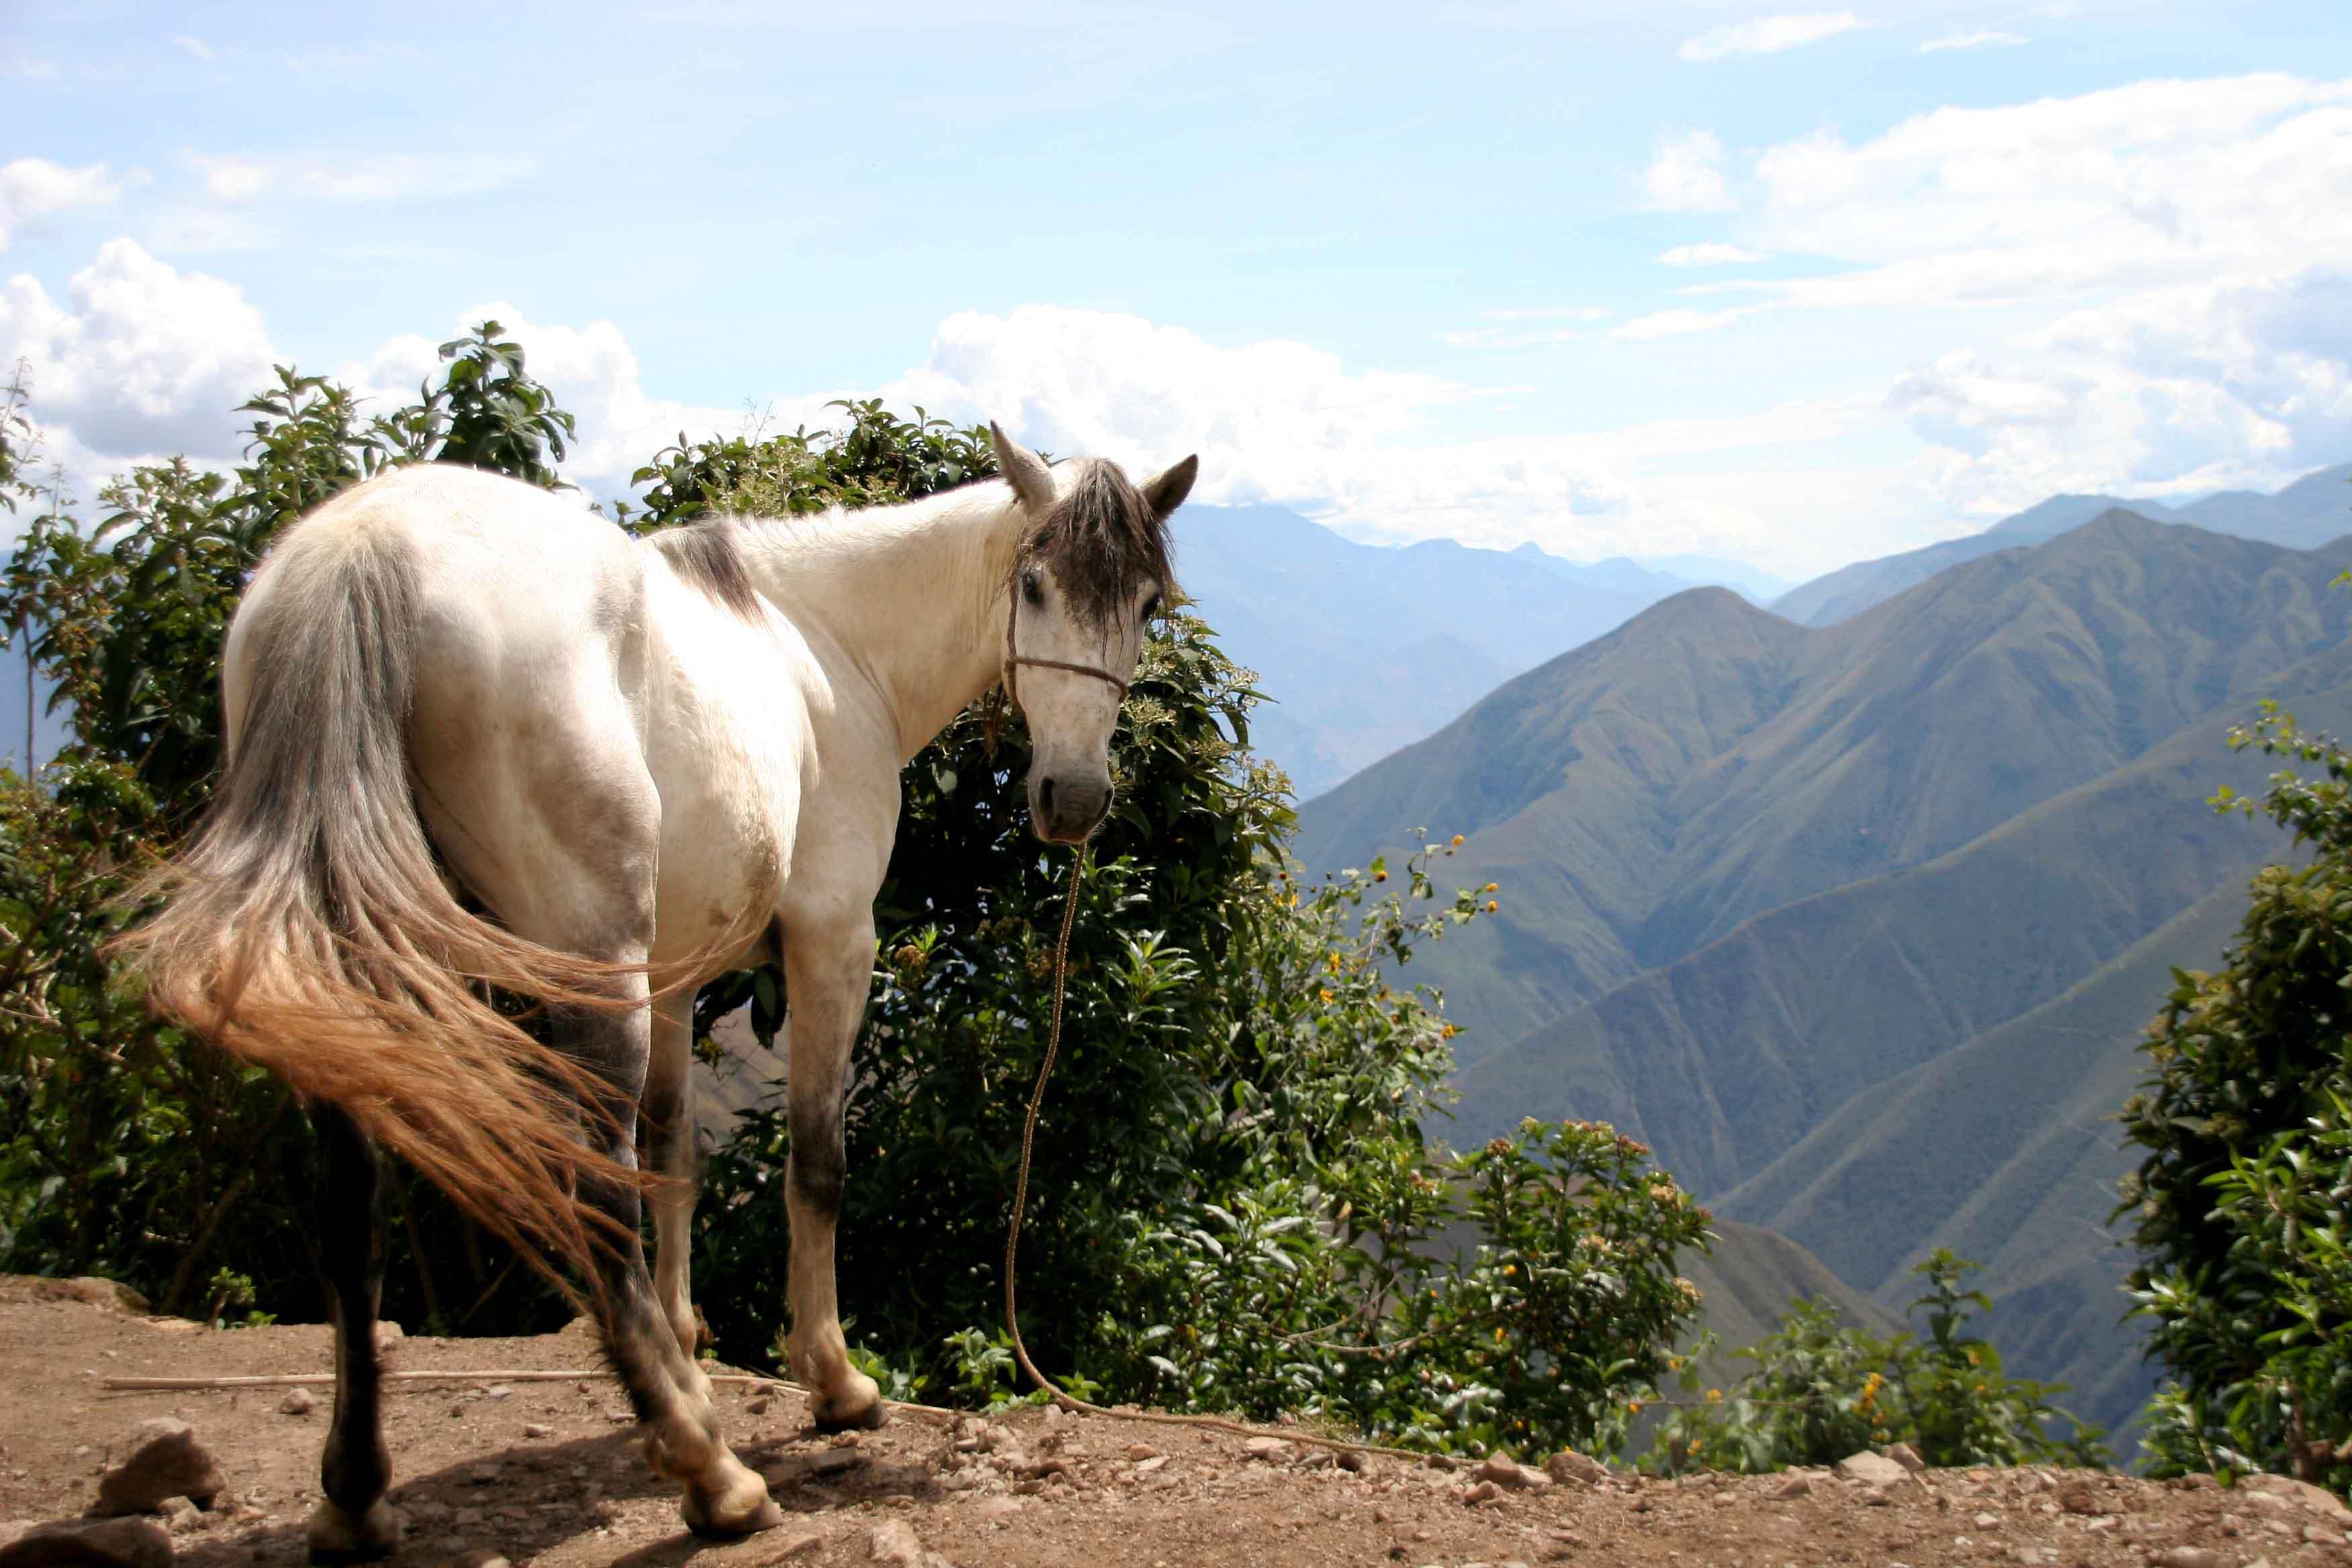 Horse | 馬 | Ngựa Sm-08-3895-white-horse-at-chanchillo